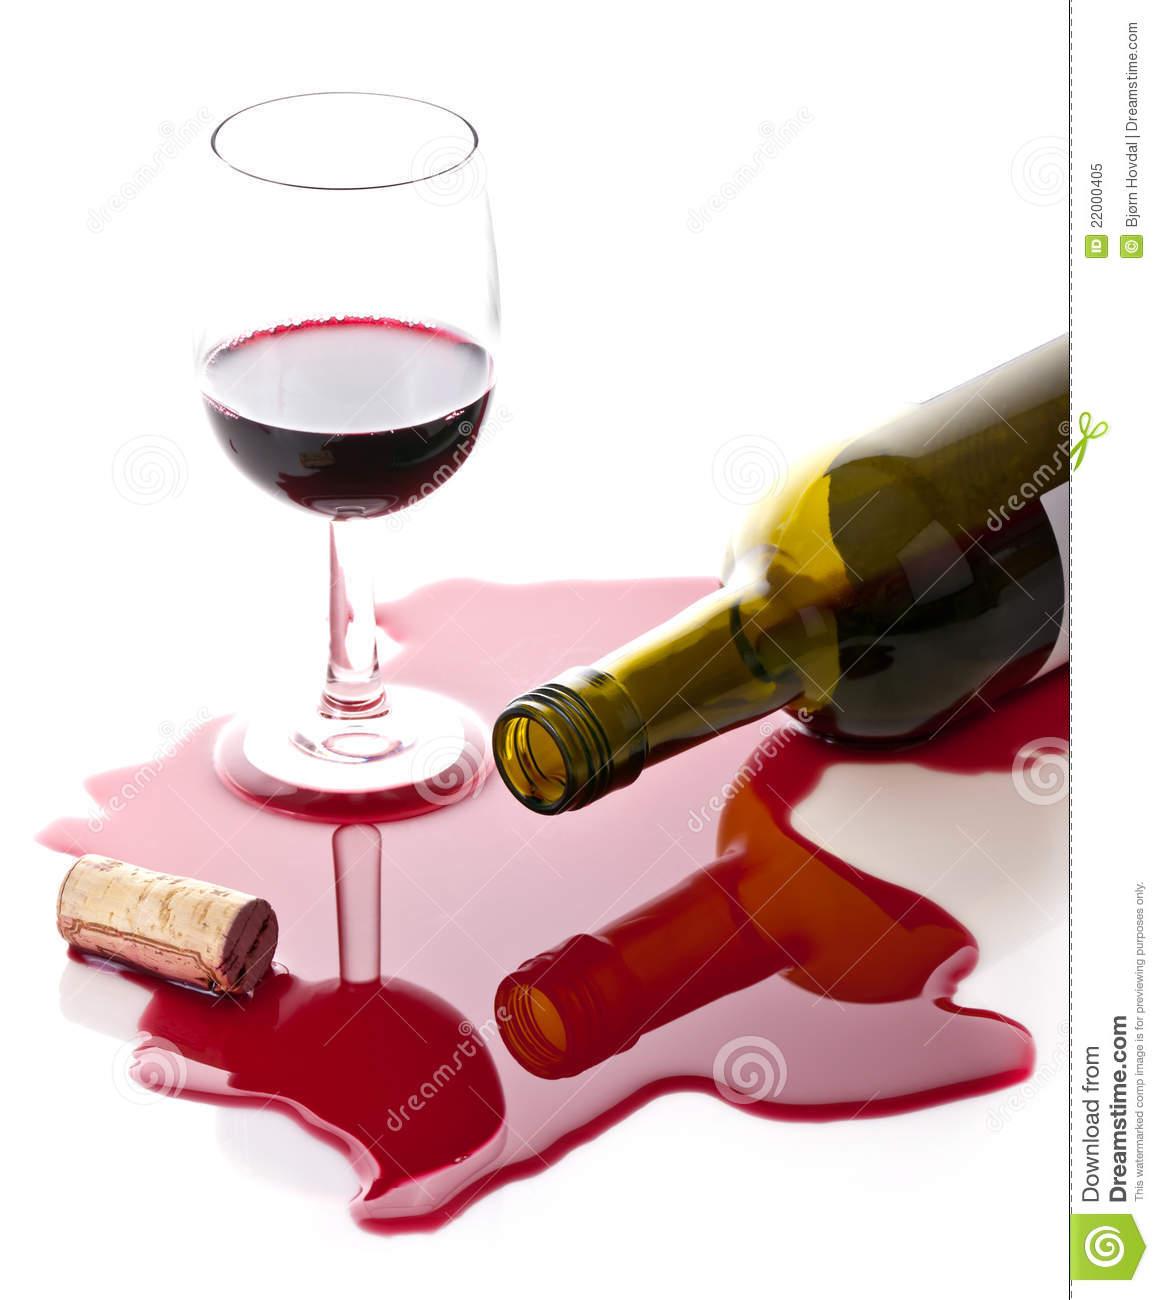 Wine Glass Spill Clipart.